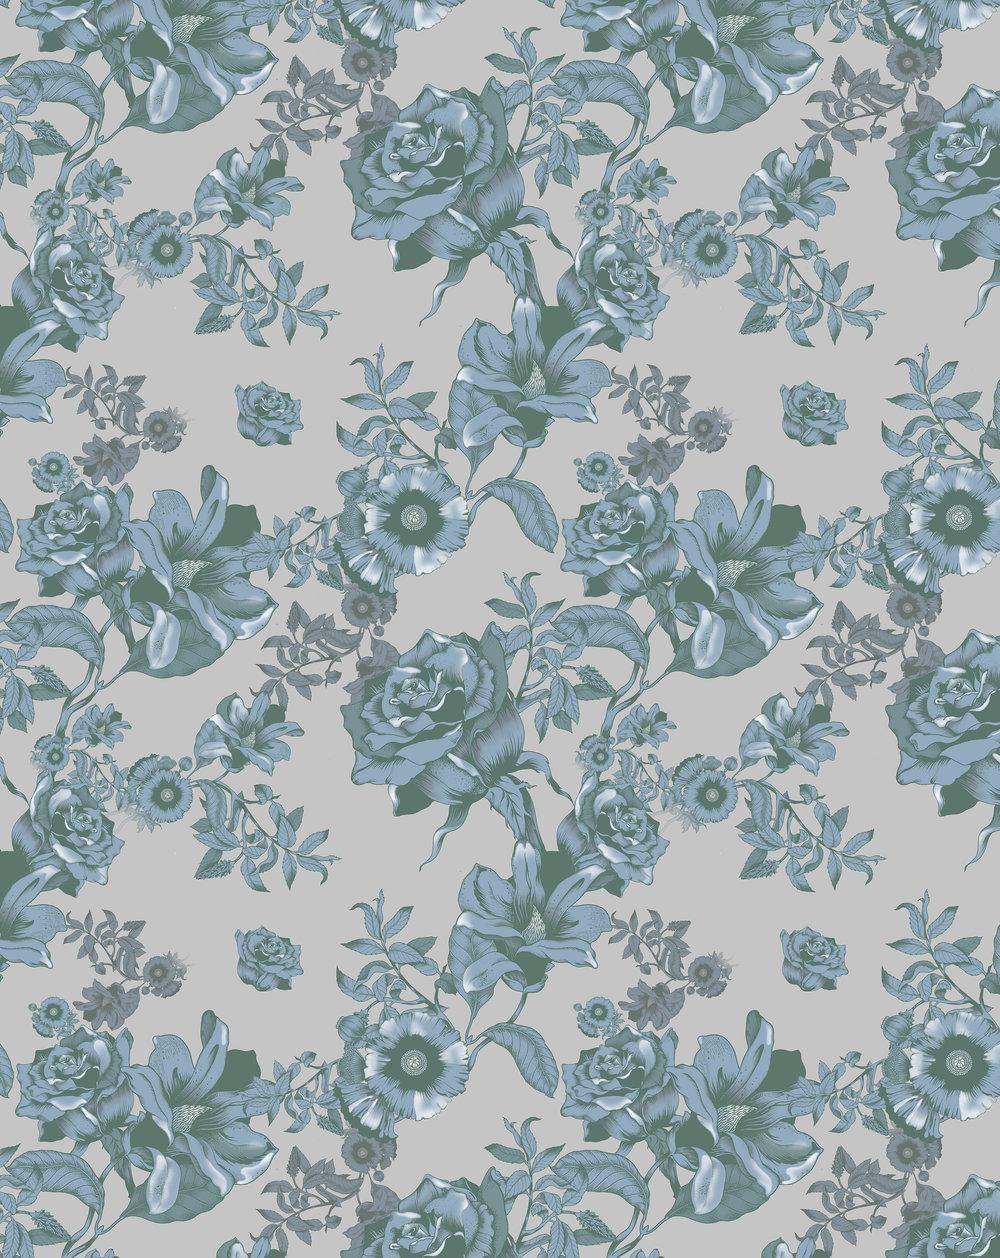 PommeChan_Pattern_Final2_Blue and Grey_Lowres_15x15.jpg